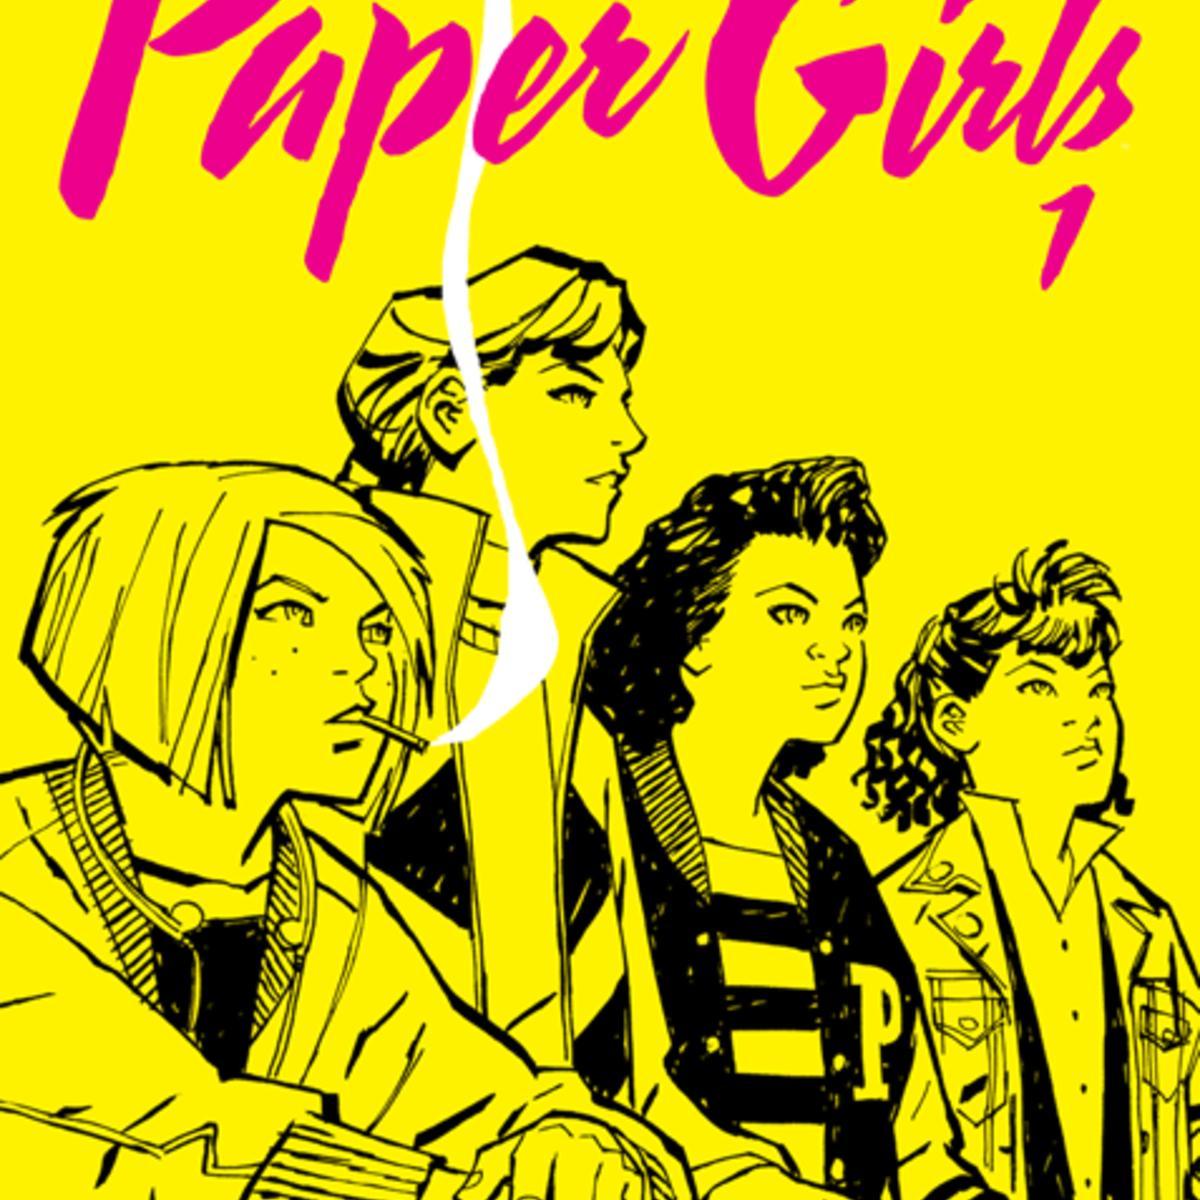 papergirls_01-1.png